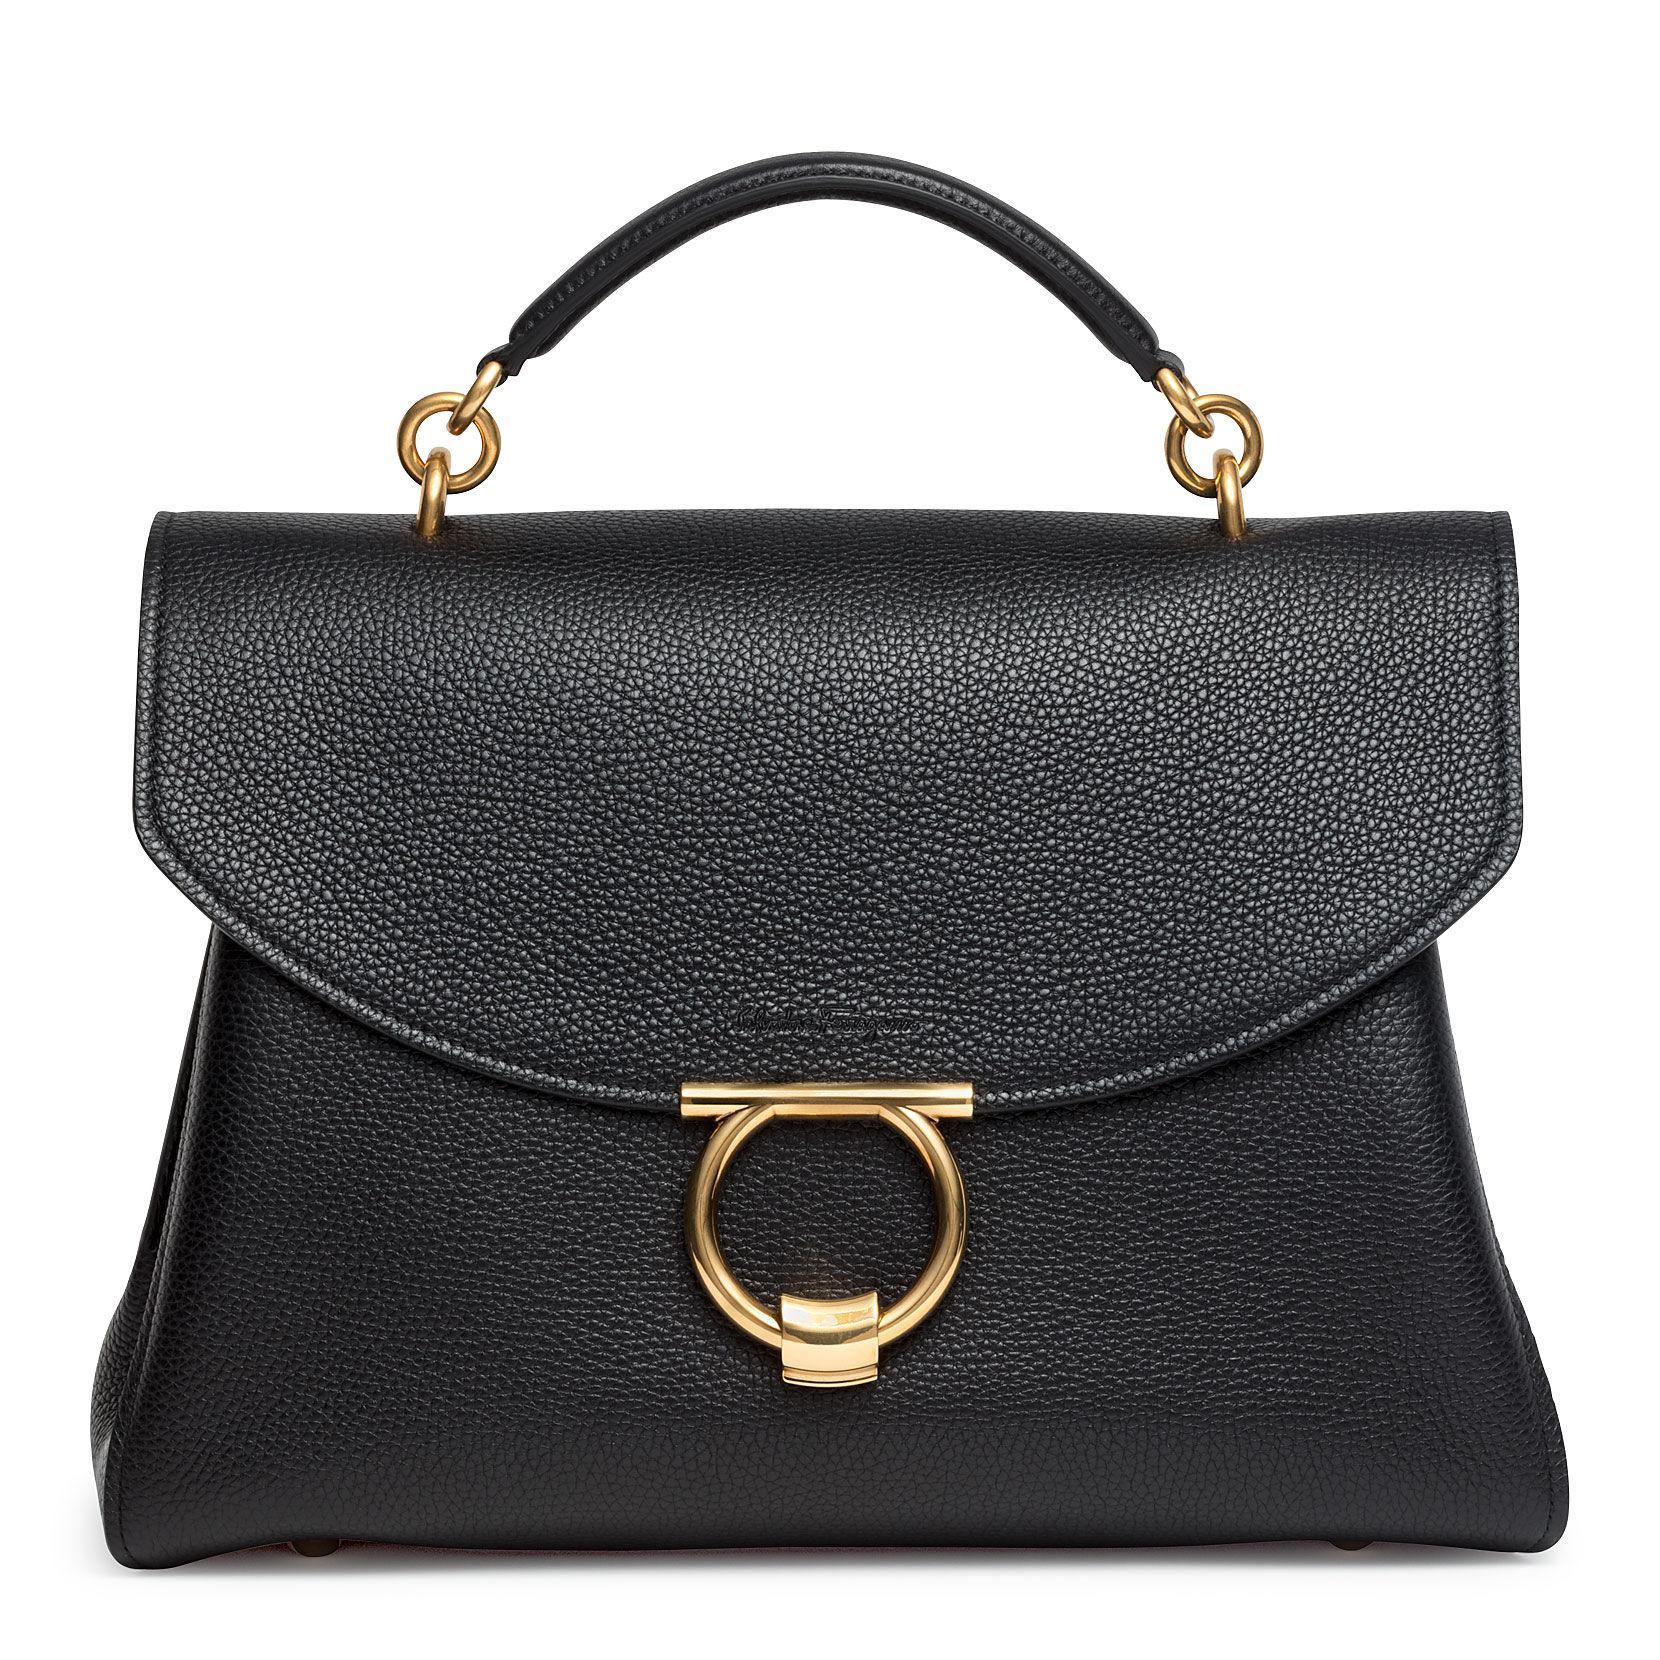 3f14a98fbb8d Ferragamo Gancini Top Handle Bag in Black - Lyst